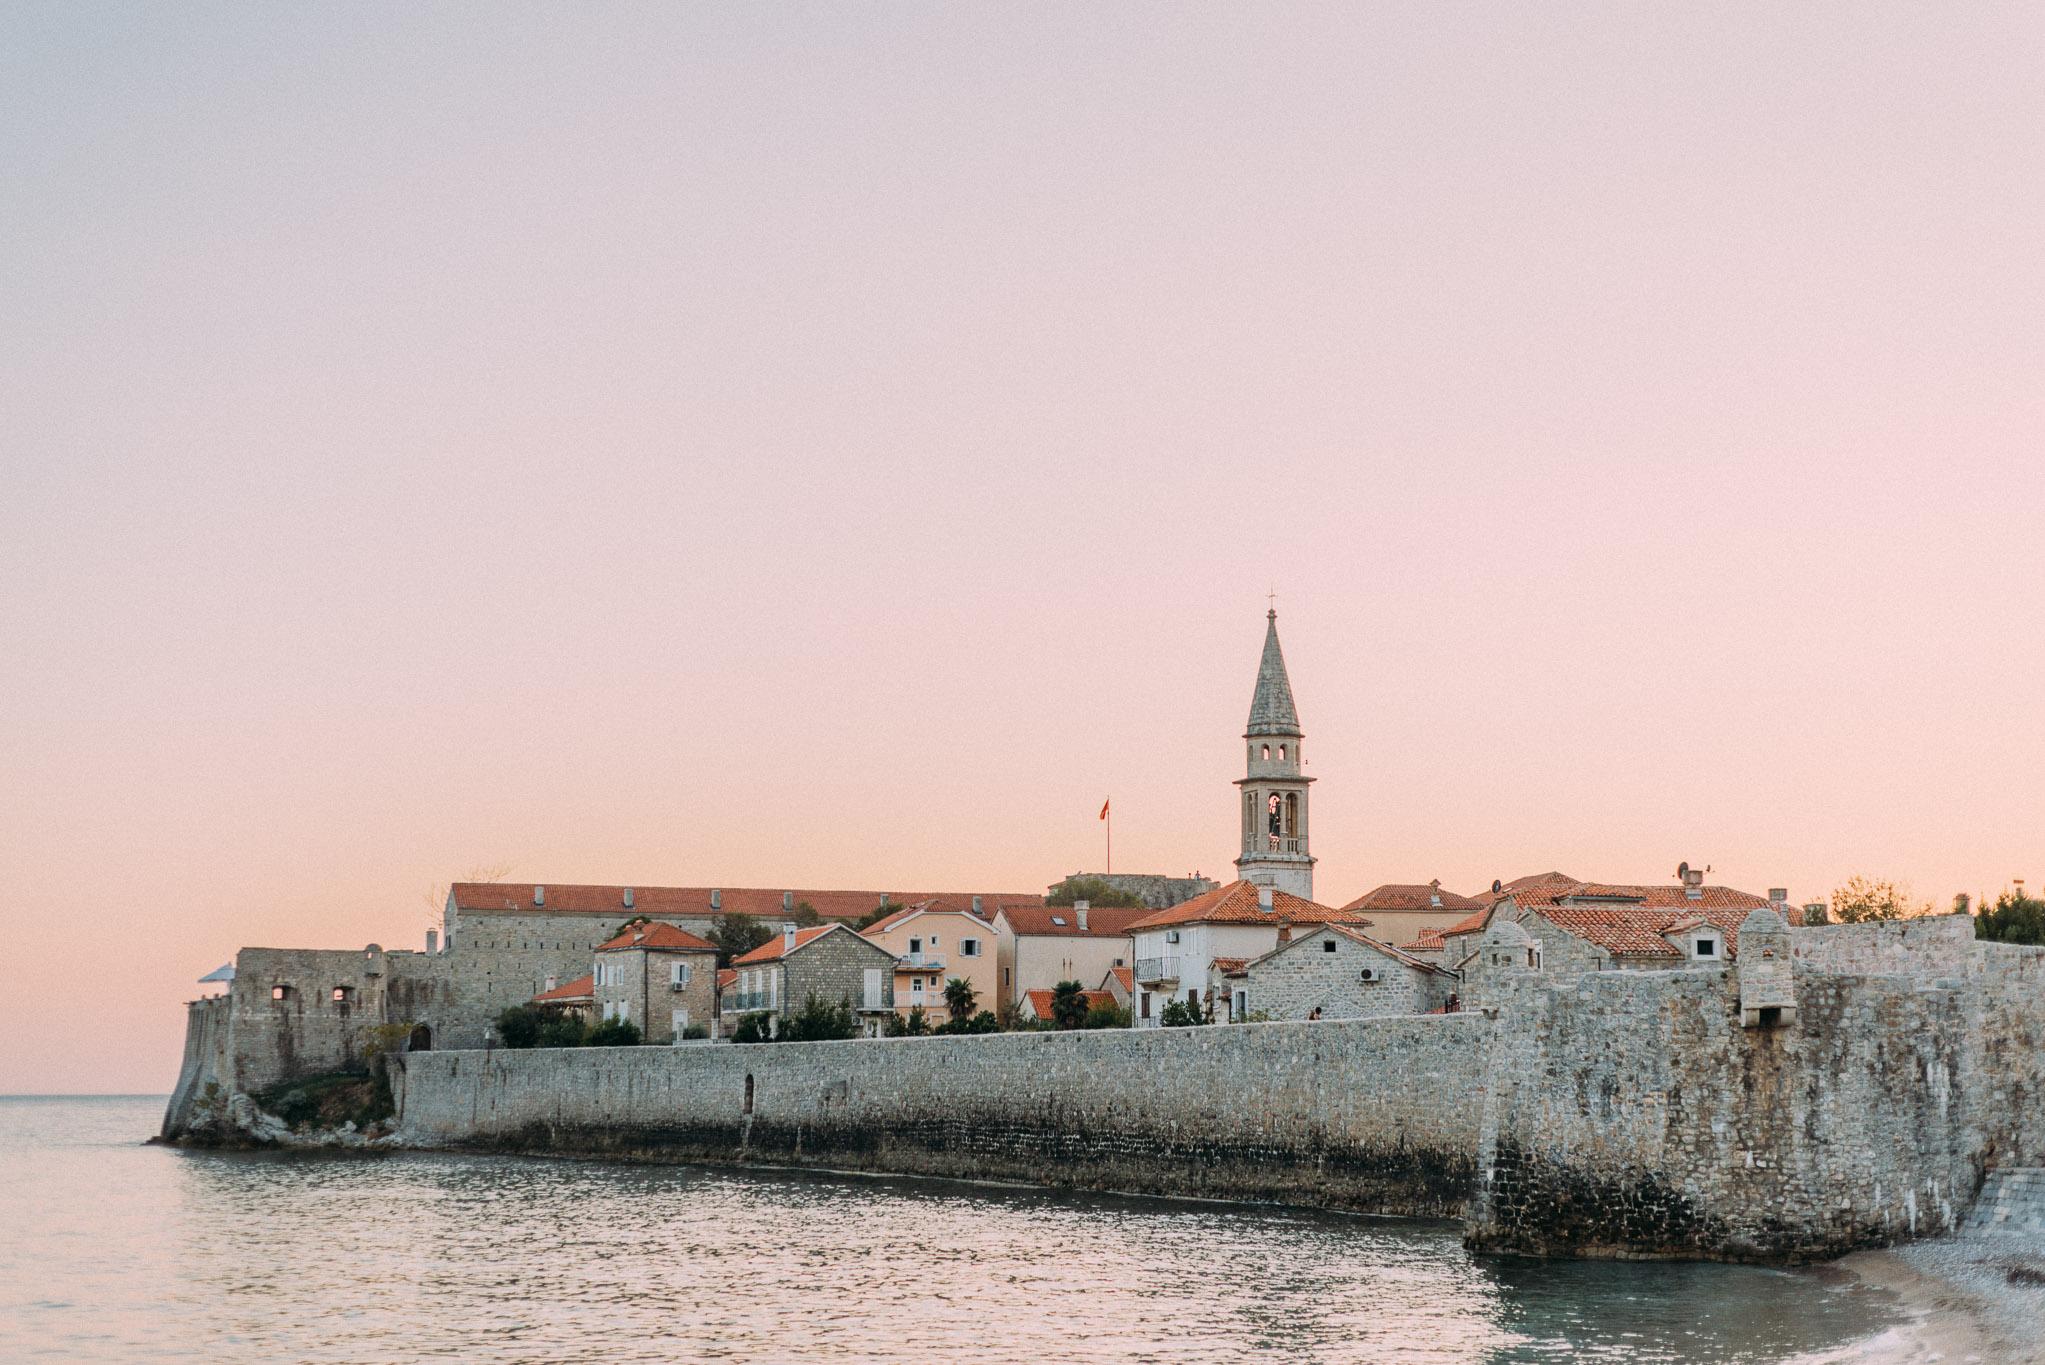 PJ Rankin_Drop in the Ocean_Montenegro-25.jpg